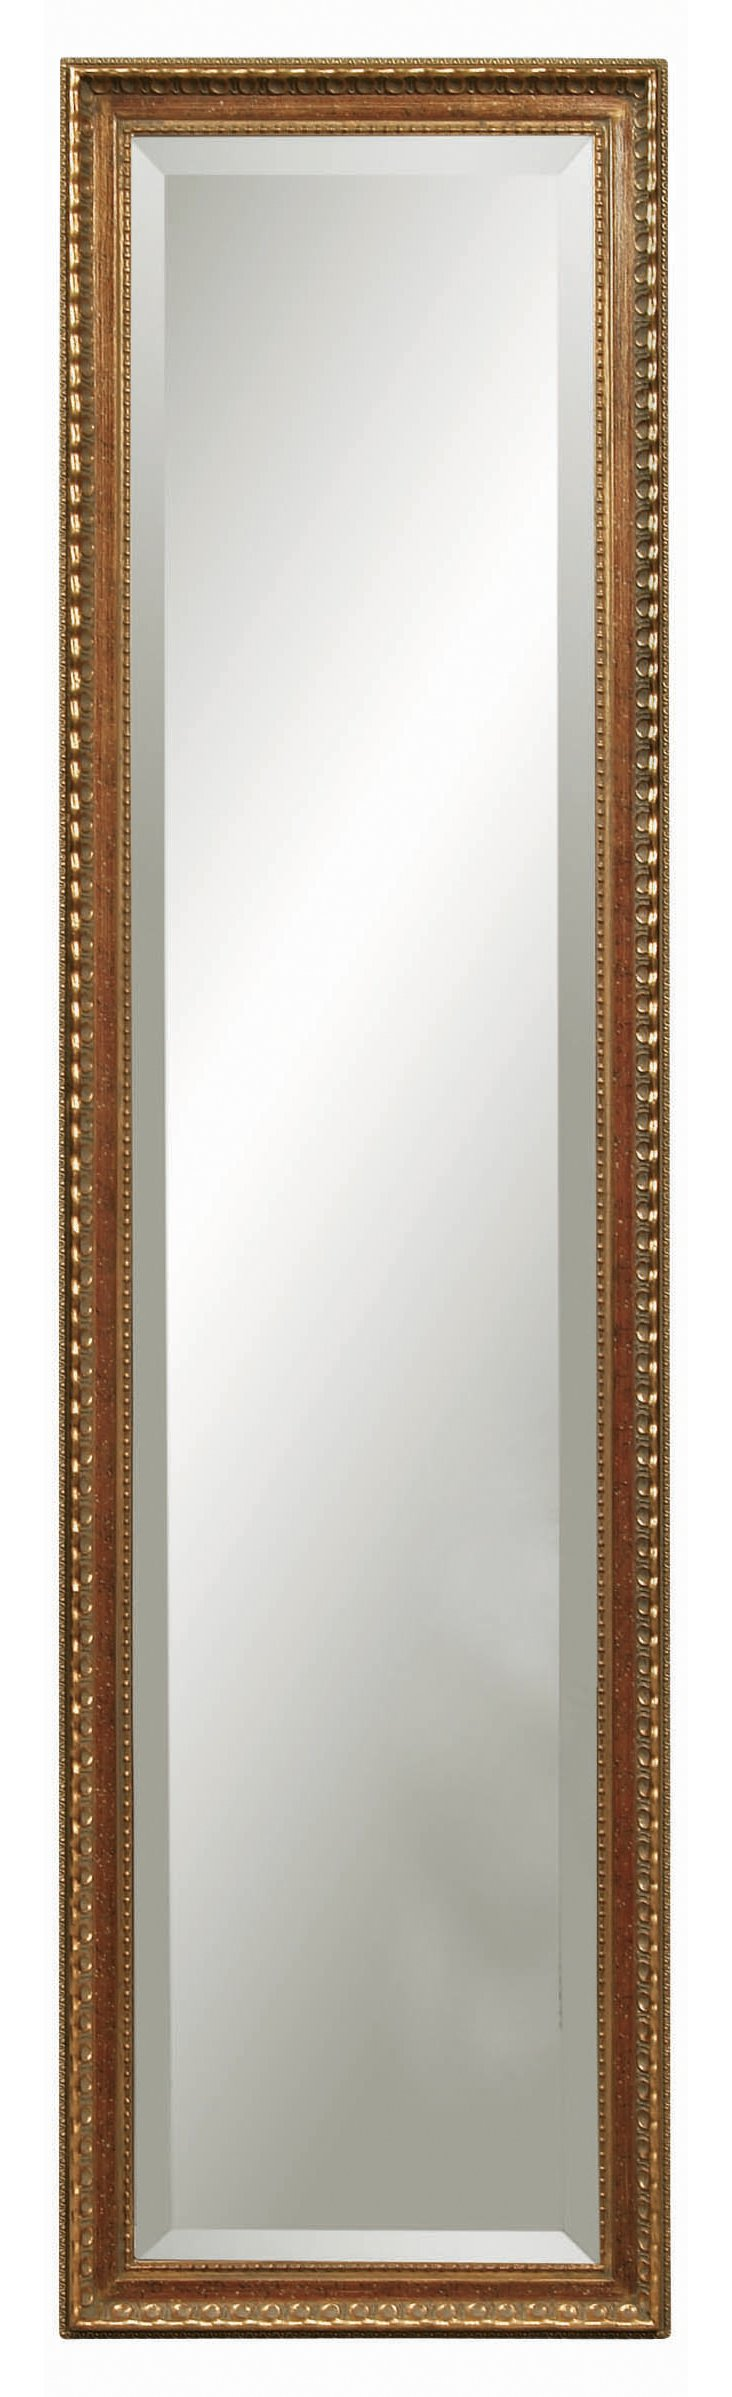 Ancona Floor Mirror, Gold